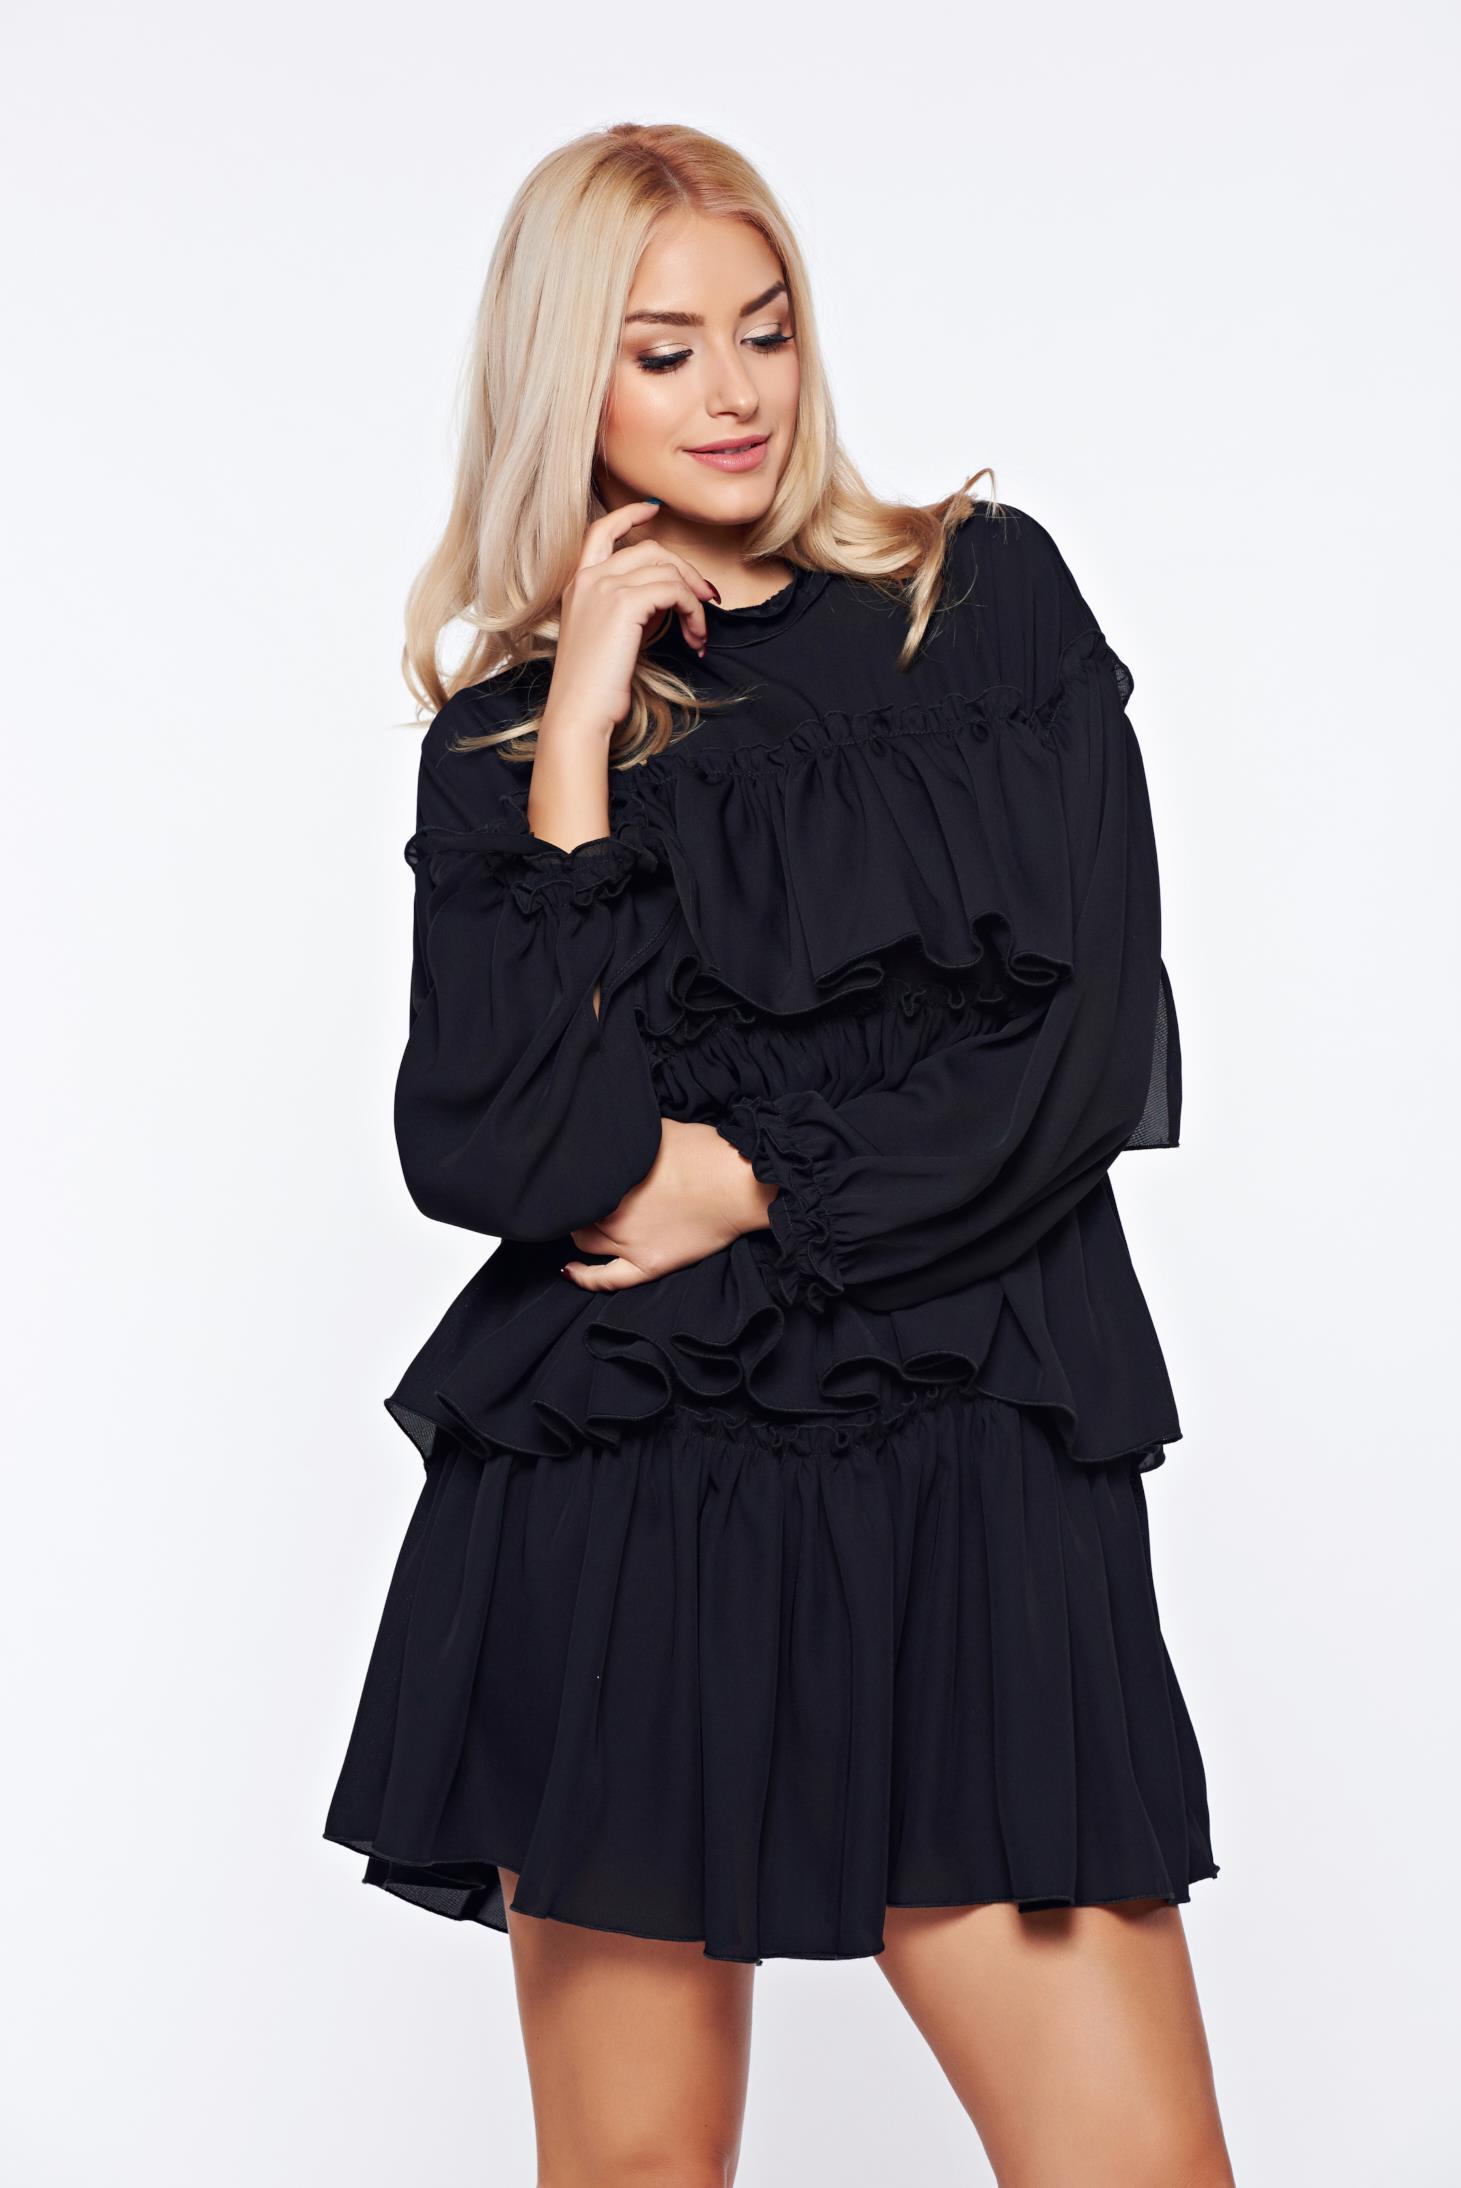 Rochie Ana Radu neagra eleganta volanase pe toata suprafata rochiei